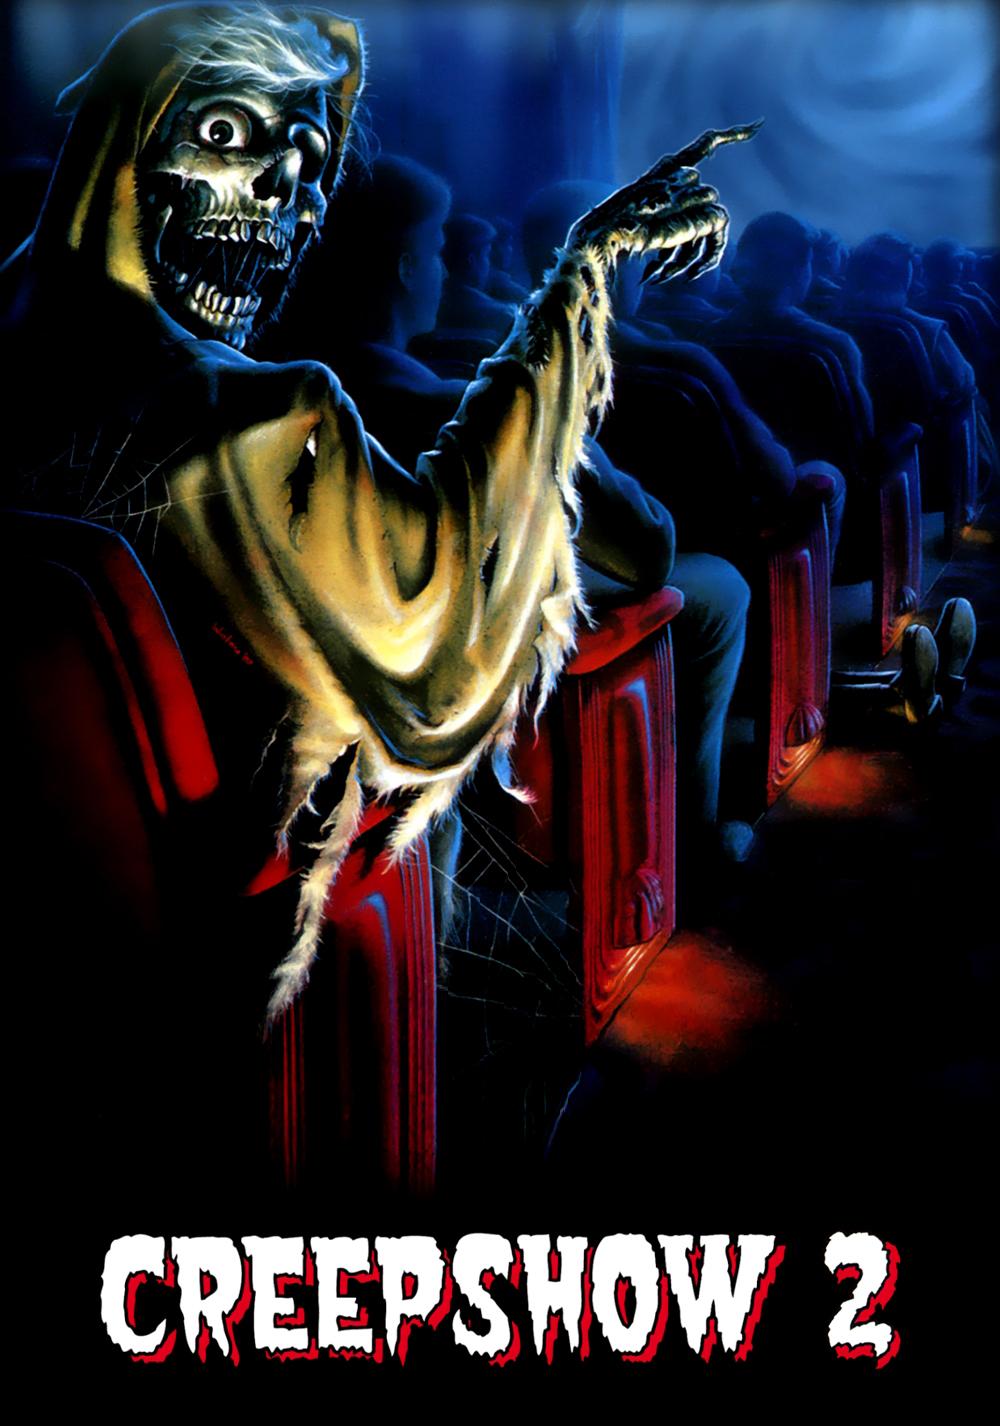 Creepshow Movie Poster Creepshow 2 Movie Poster Image